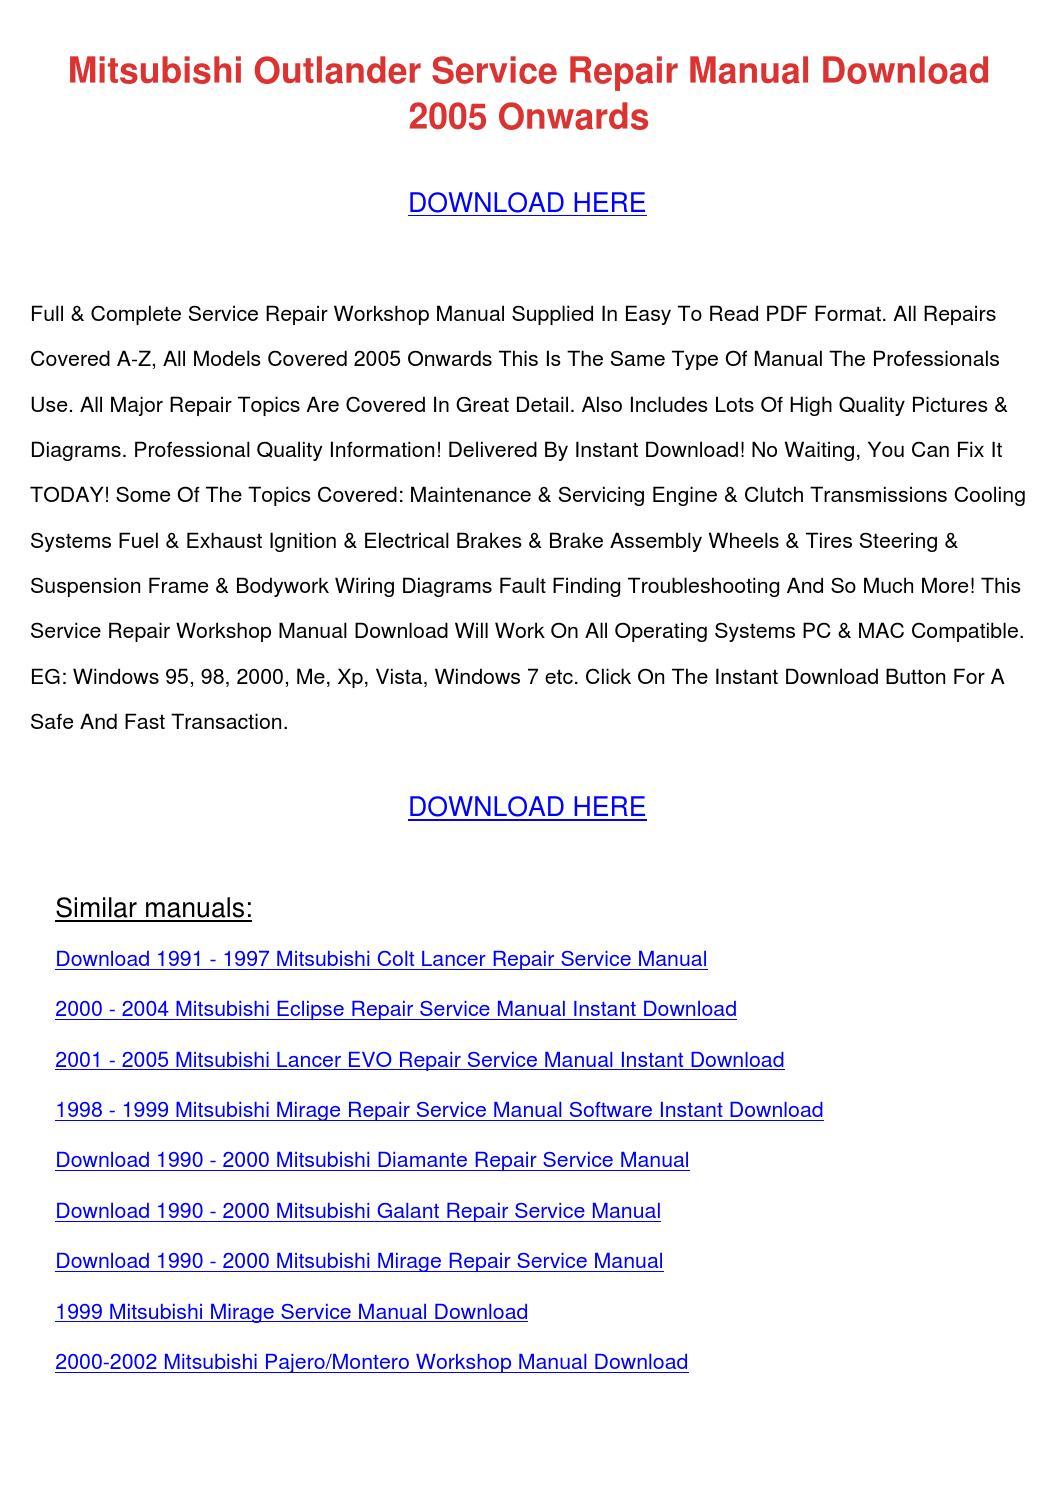 Download 1991 1997 Mitsubishi Colt Lancer Repair Service Manual 60 Amp Fuse Box Outlander Do By